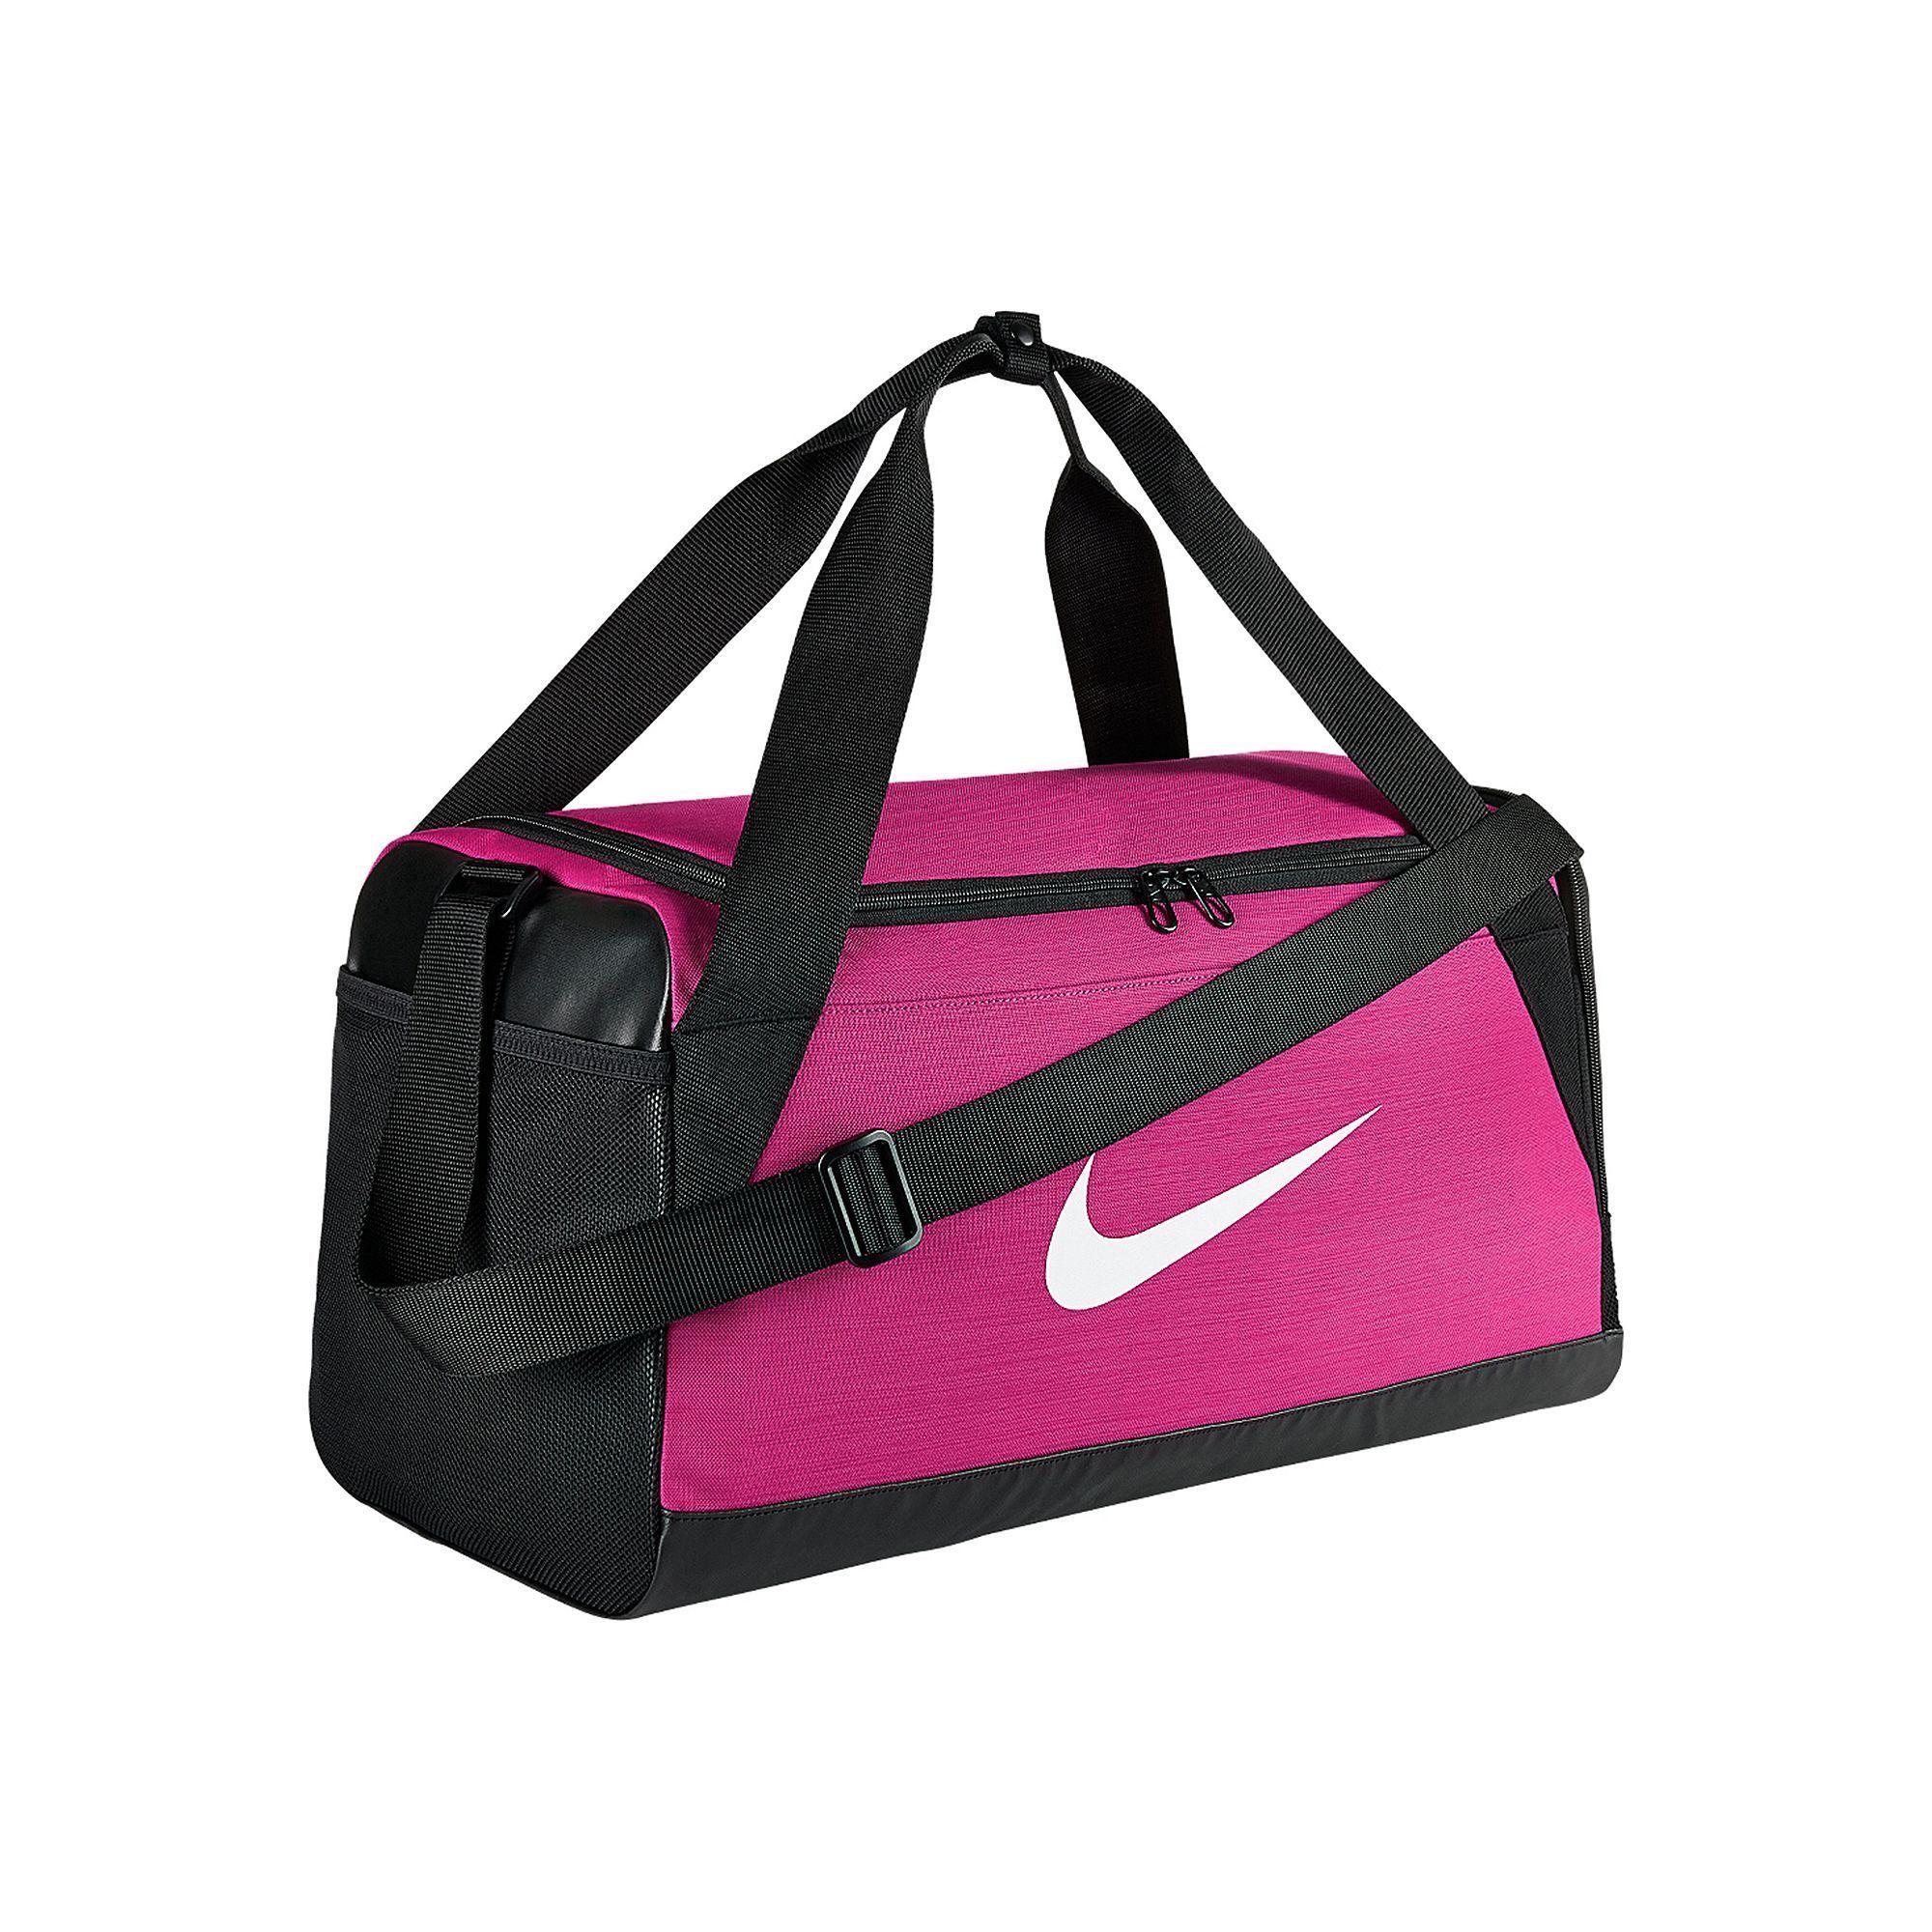 64215cd6e0a8 Nike Brasilia 7 Extra Small Duffel Bag